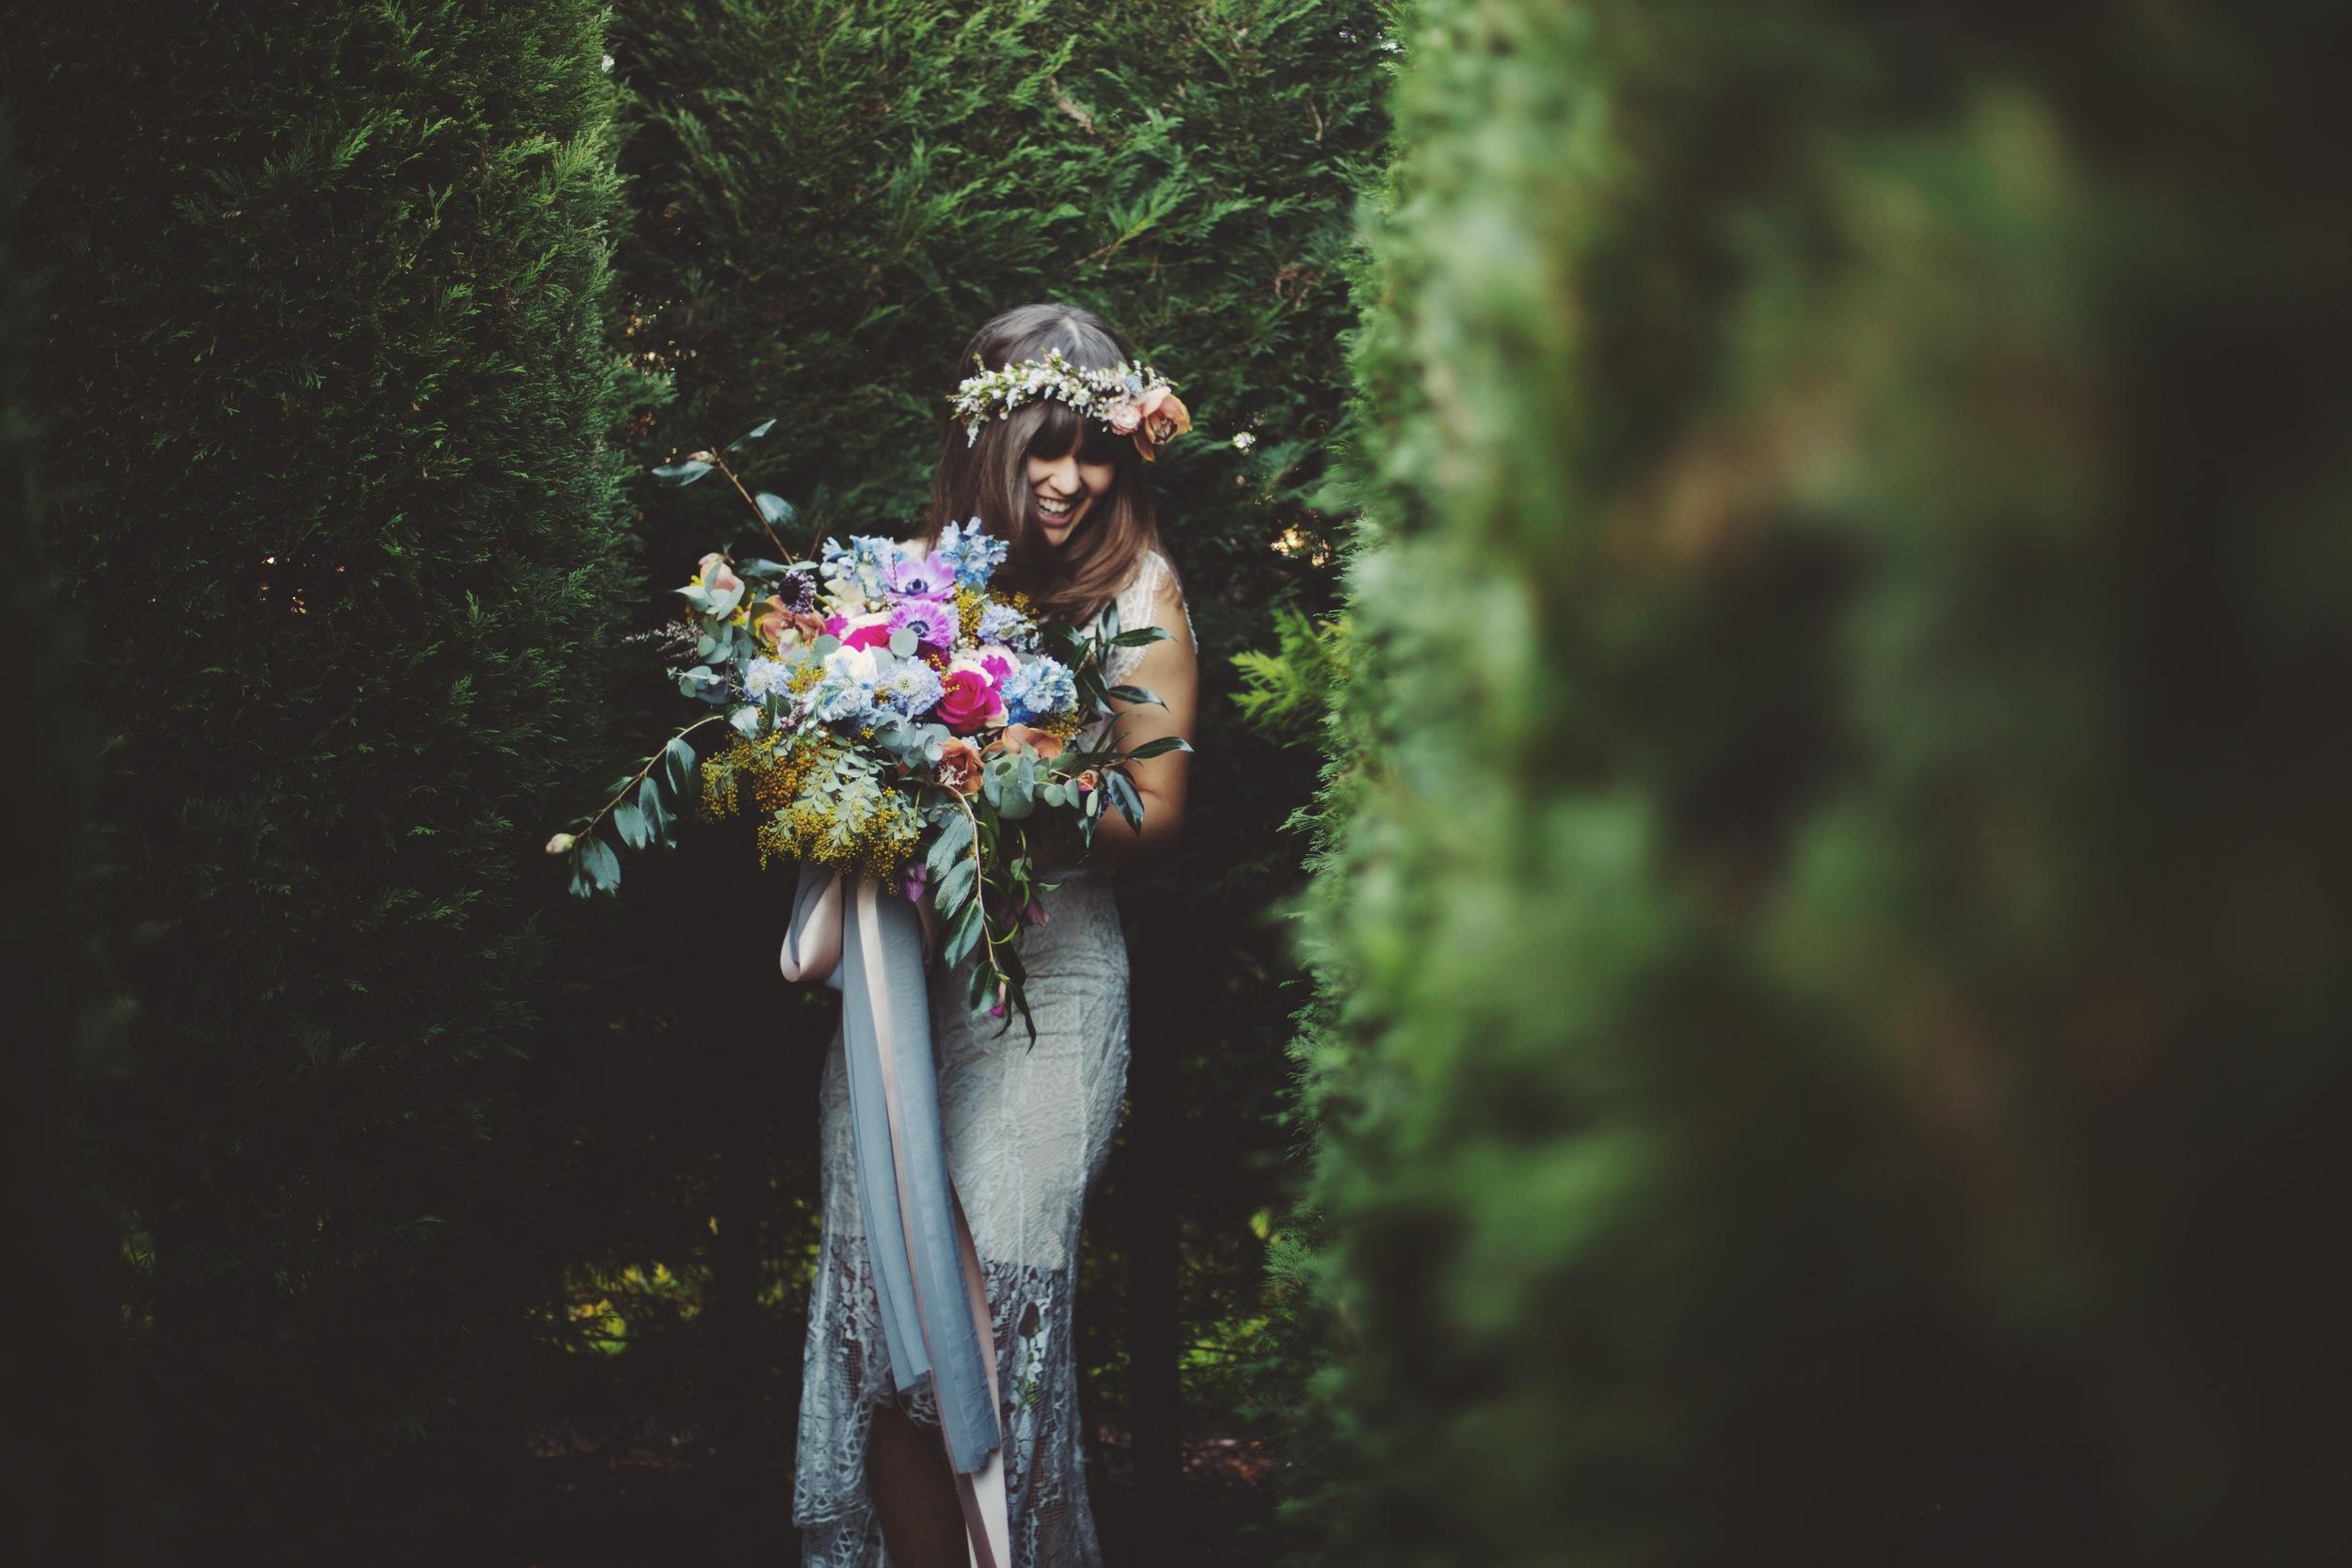 Whimsical Weddings for the Modern Bride